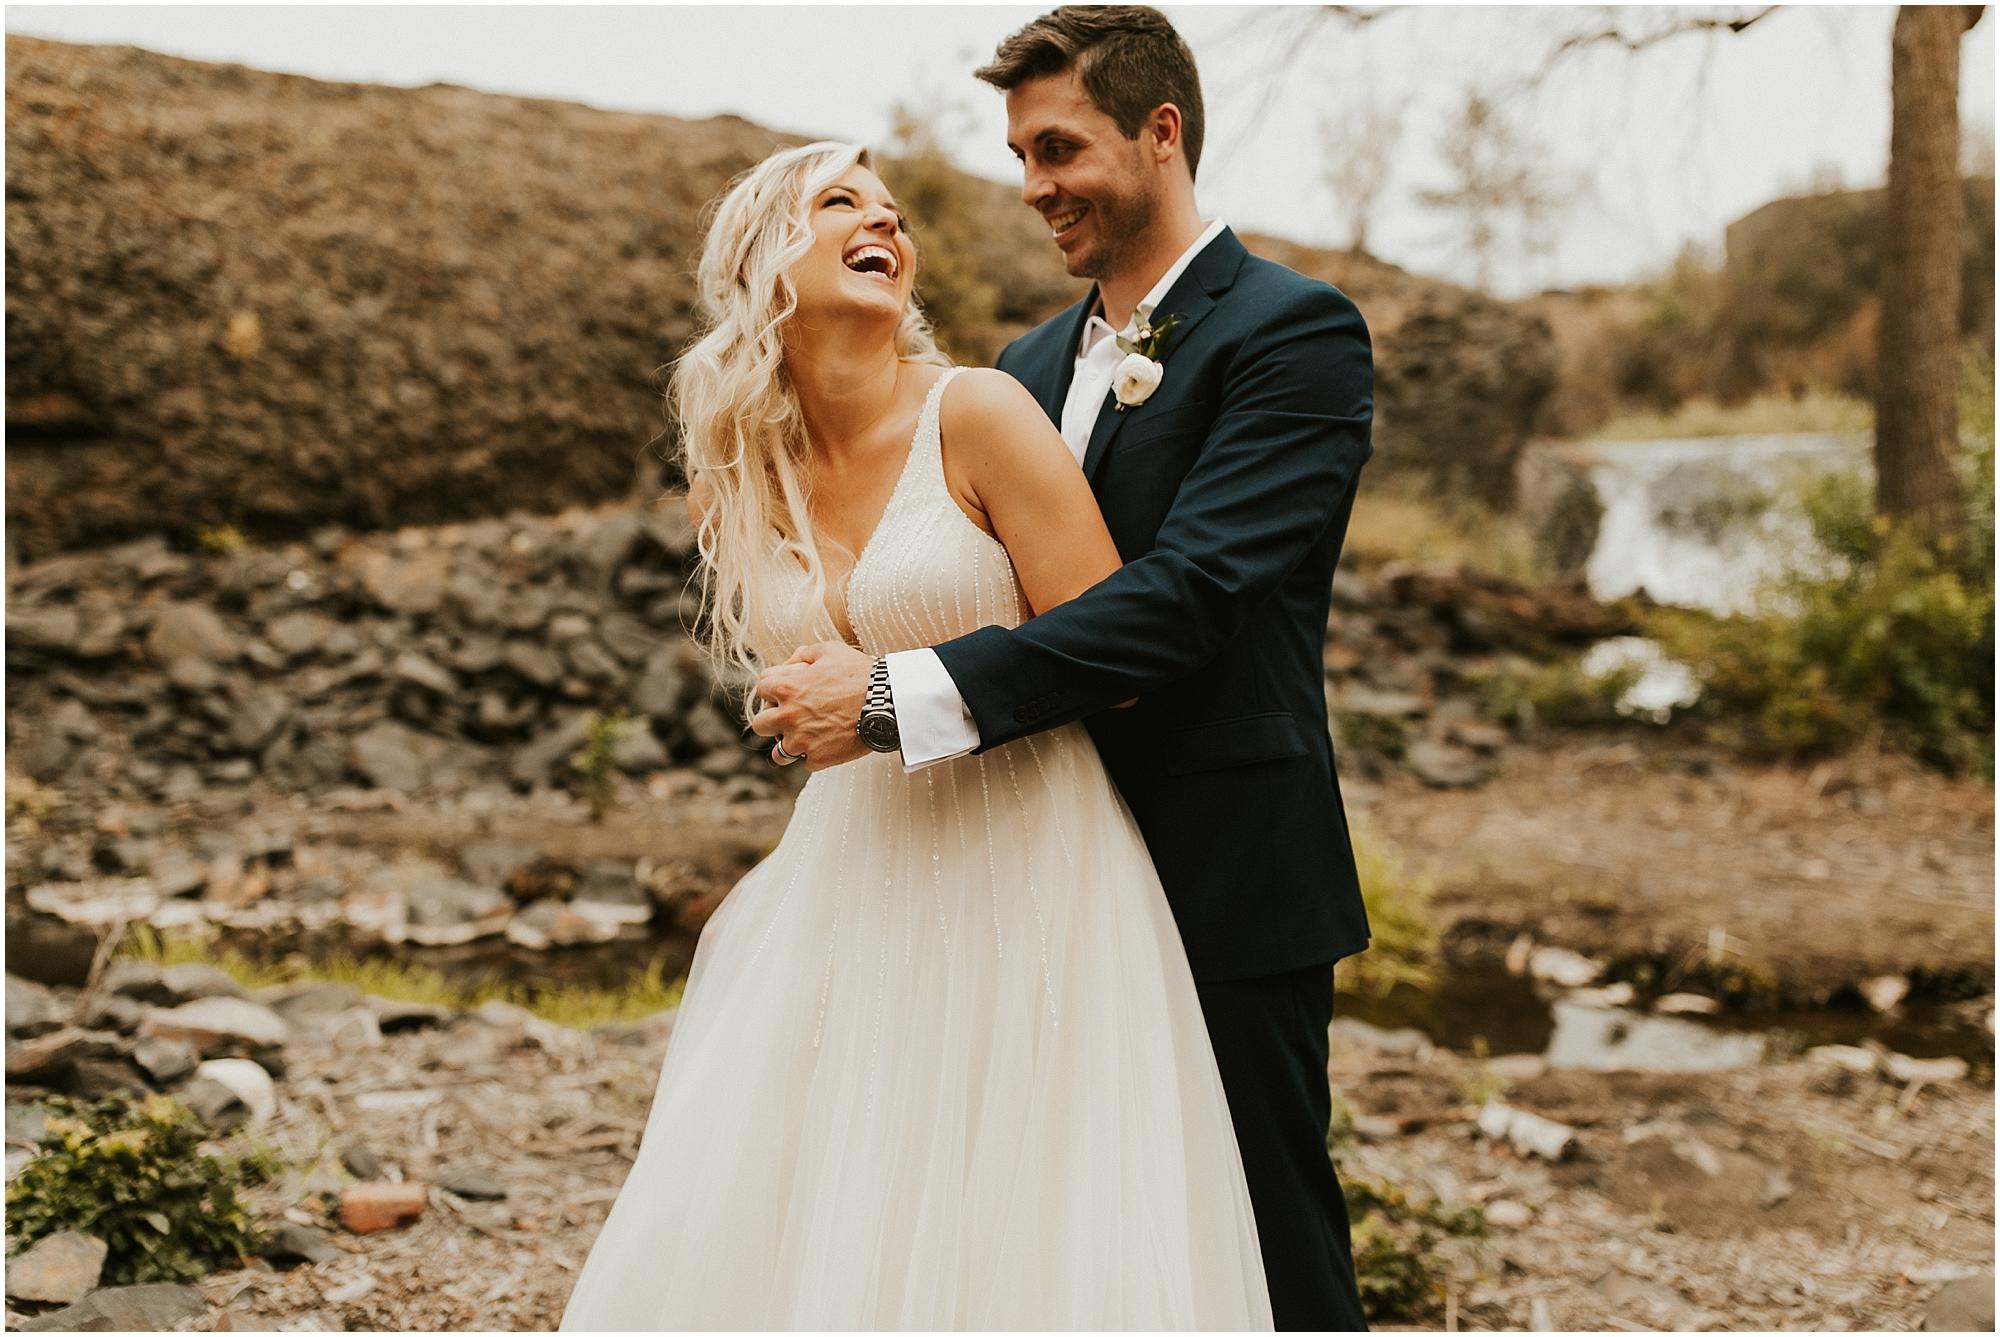 Chateau Rive Spokane Wedding Cassie Trottier Photography1105.jpg